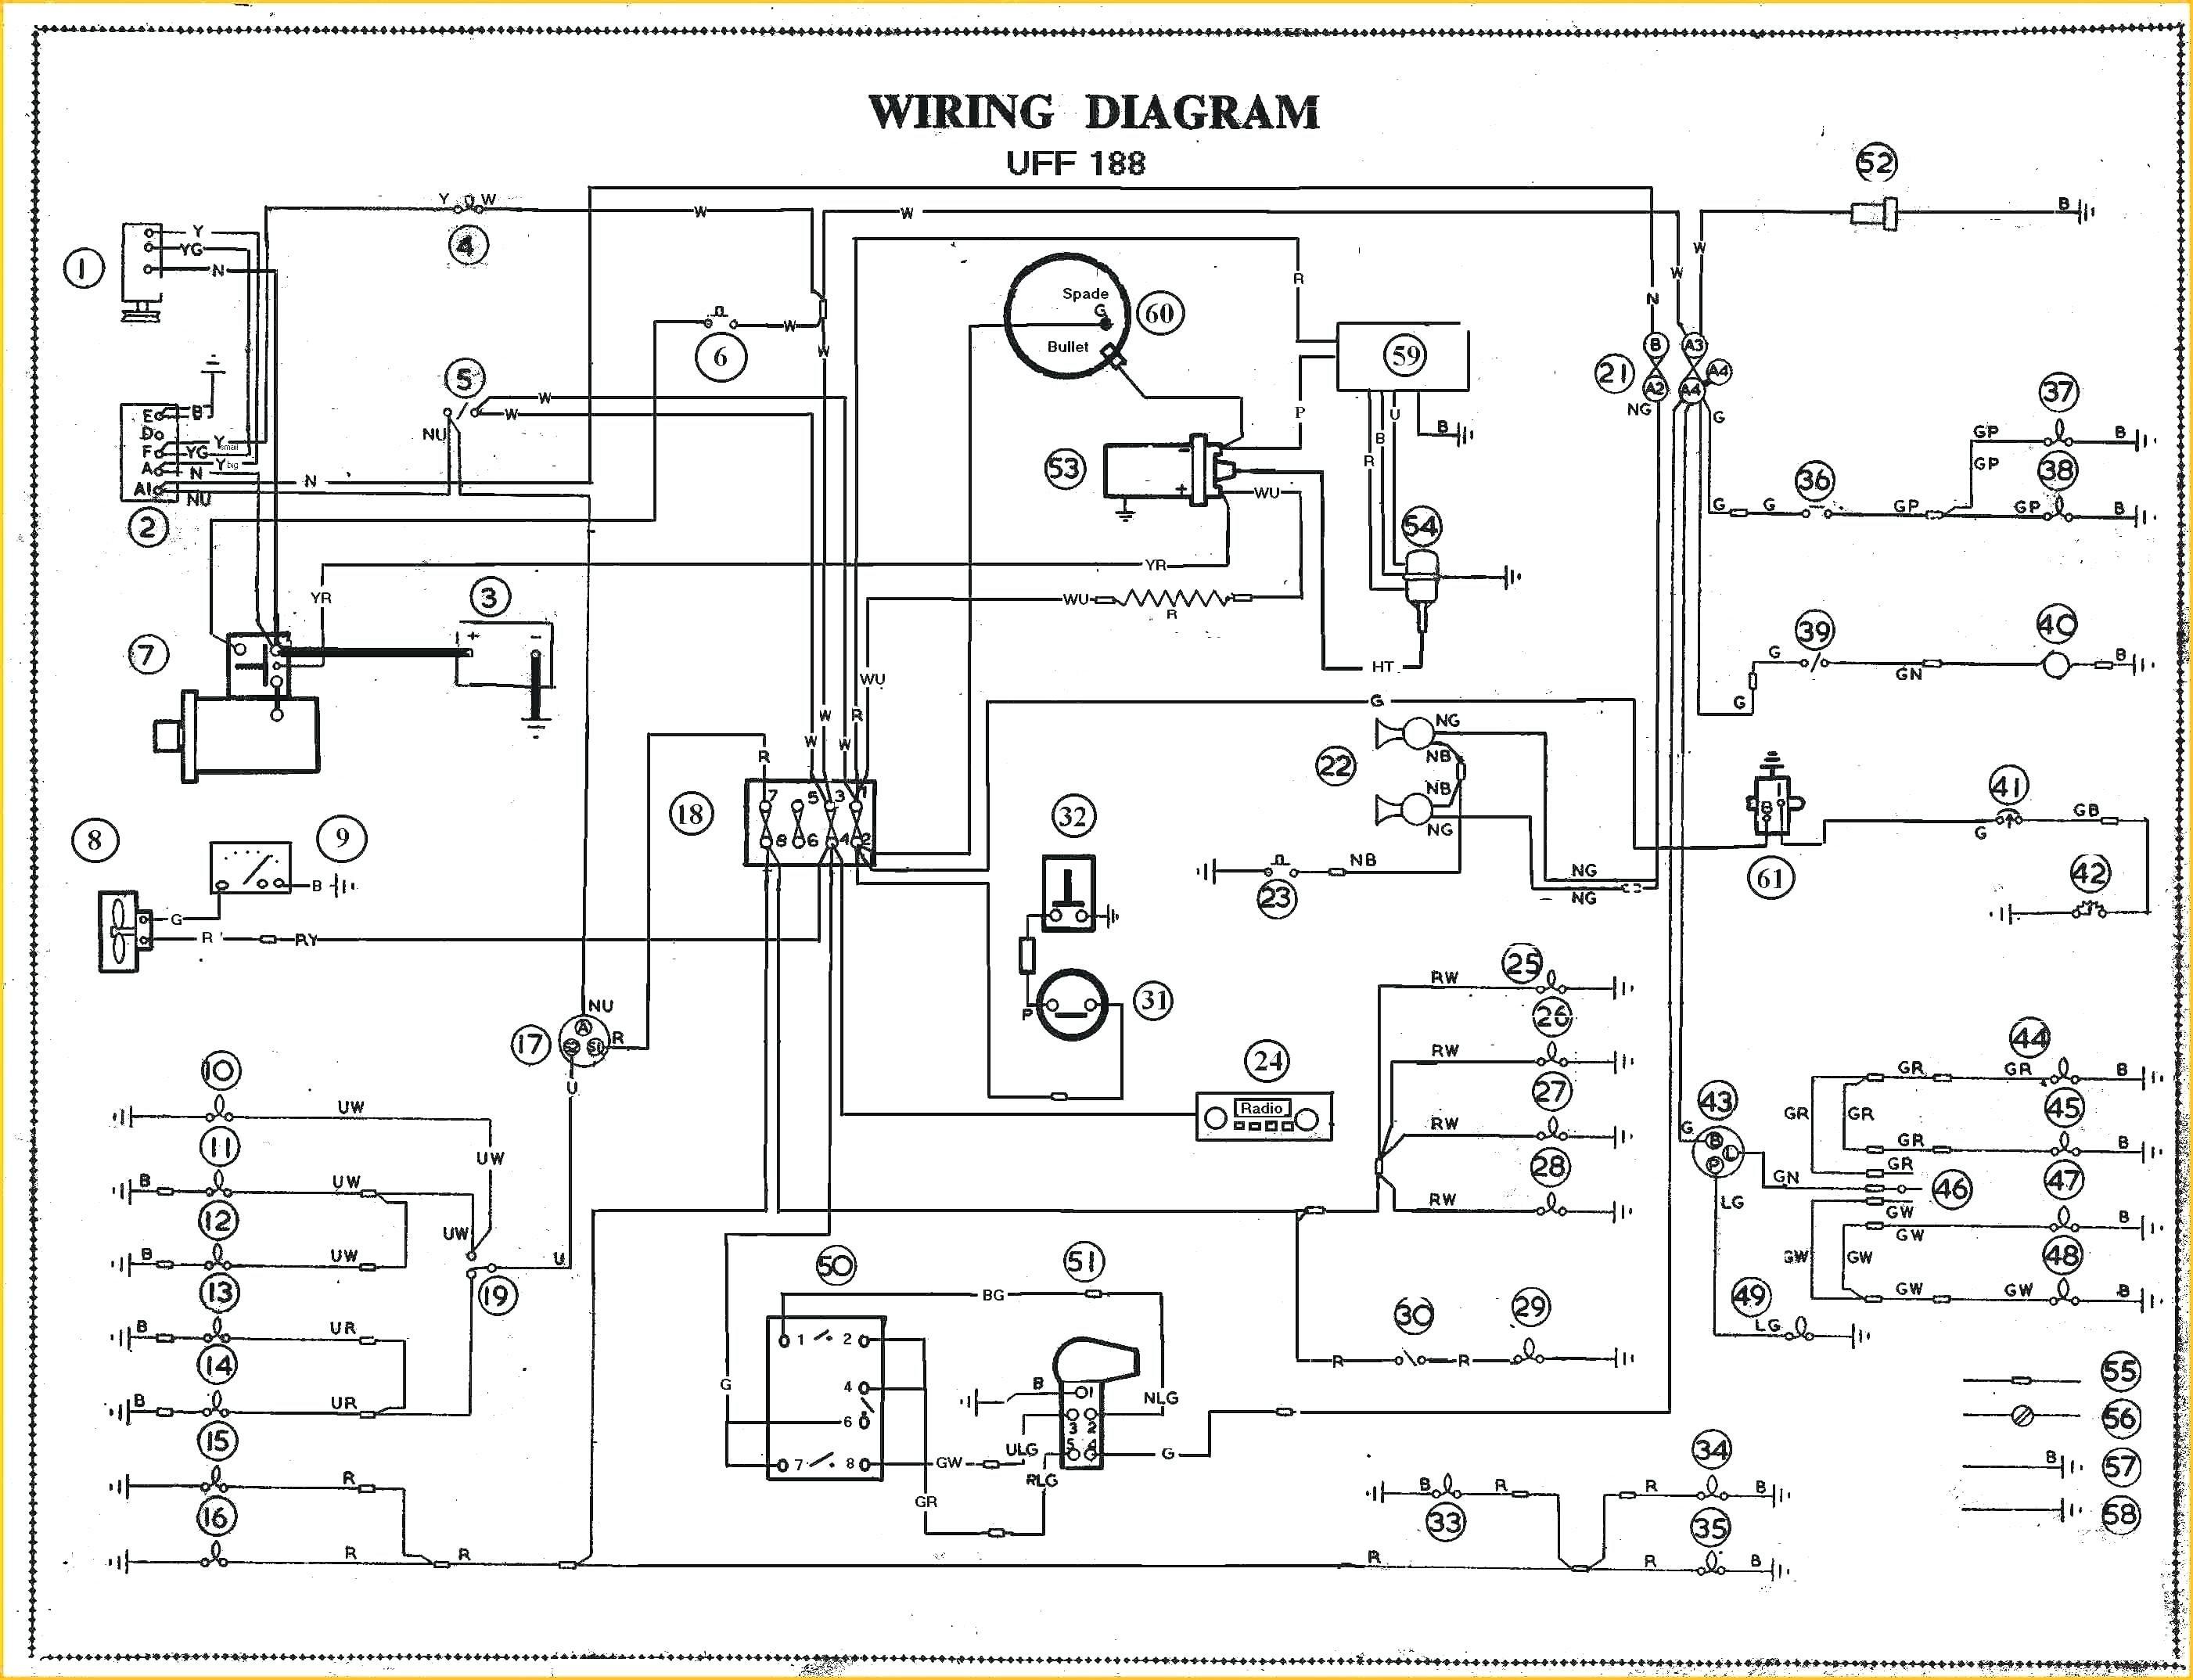 Air Conditioner Wiring Diagram Pdf Wiring Diagram Hvac Wiring Diagram Review